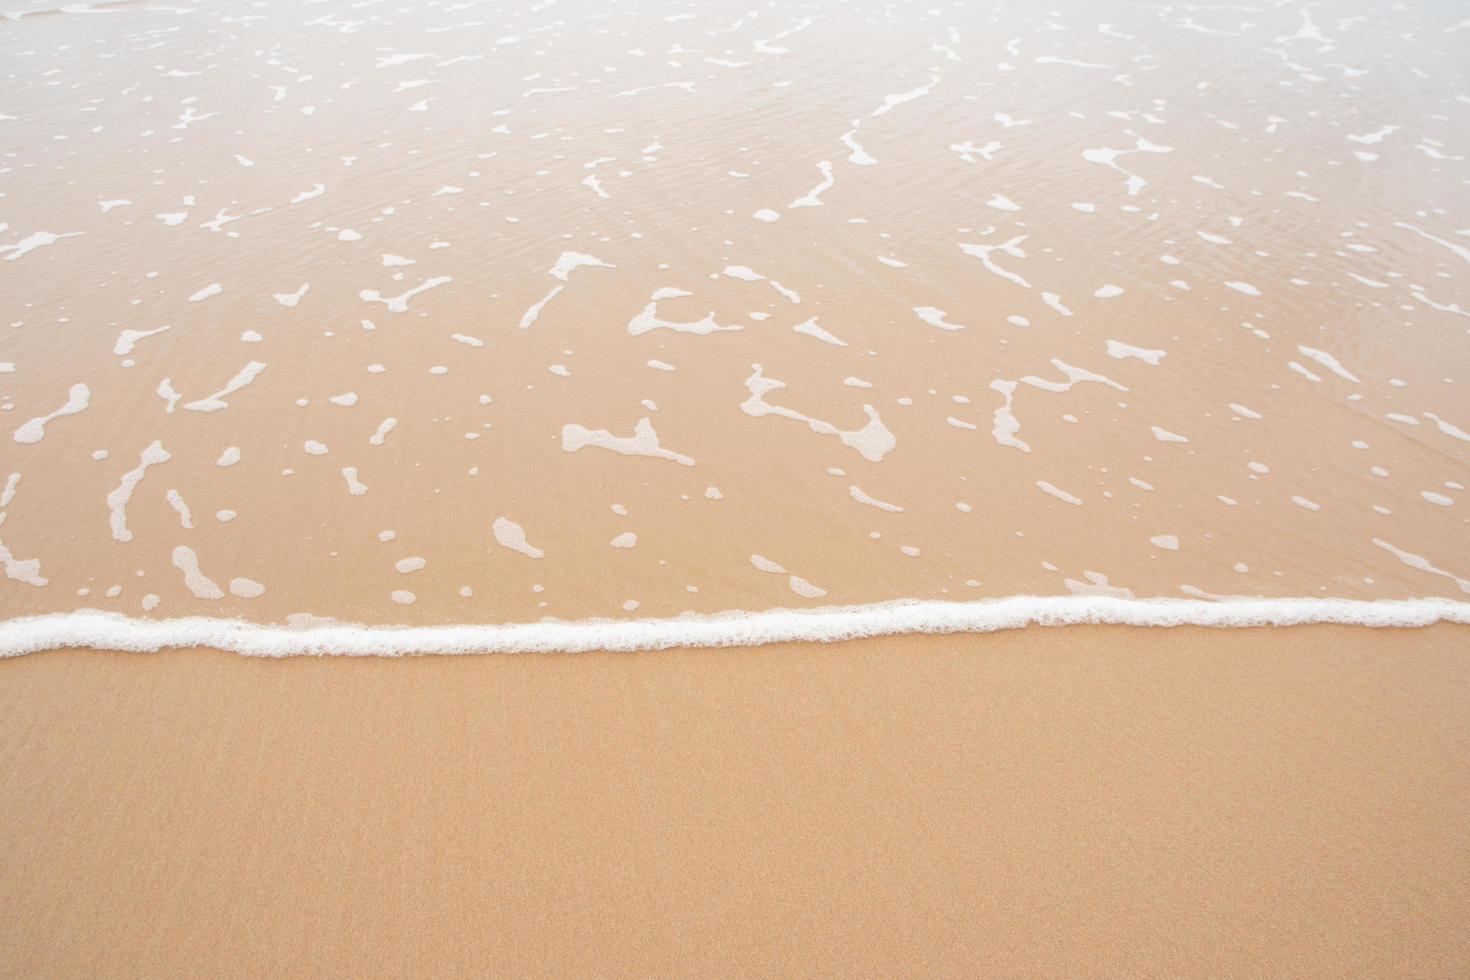 golven naderen strand foto